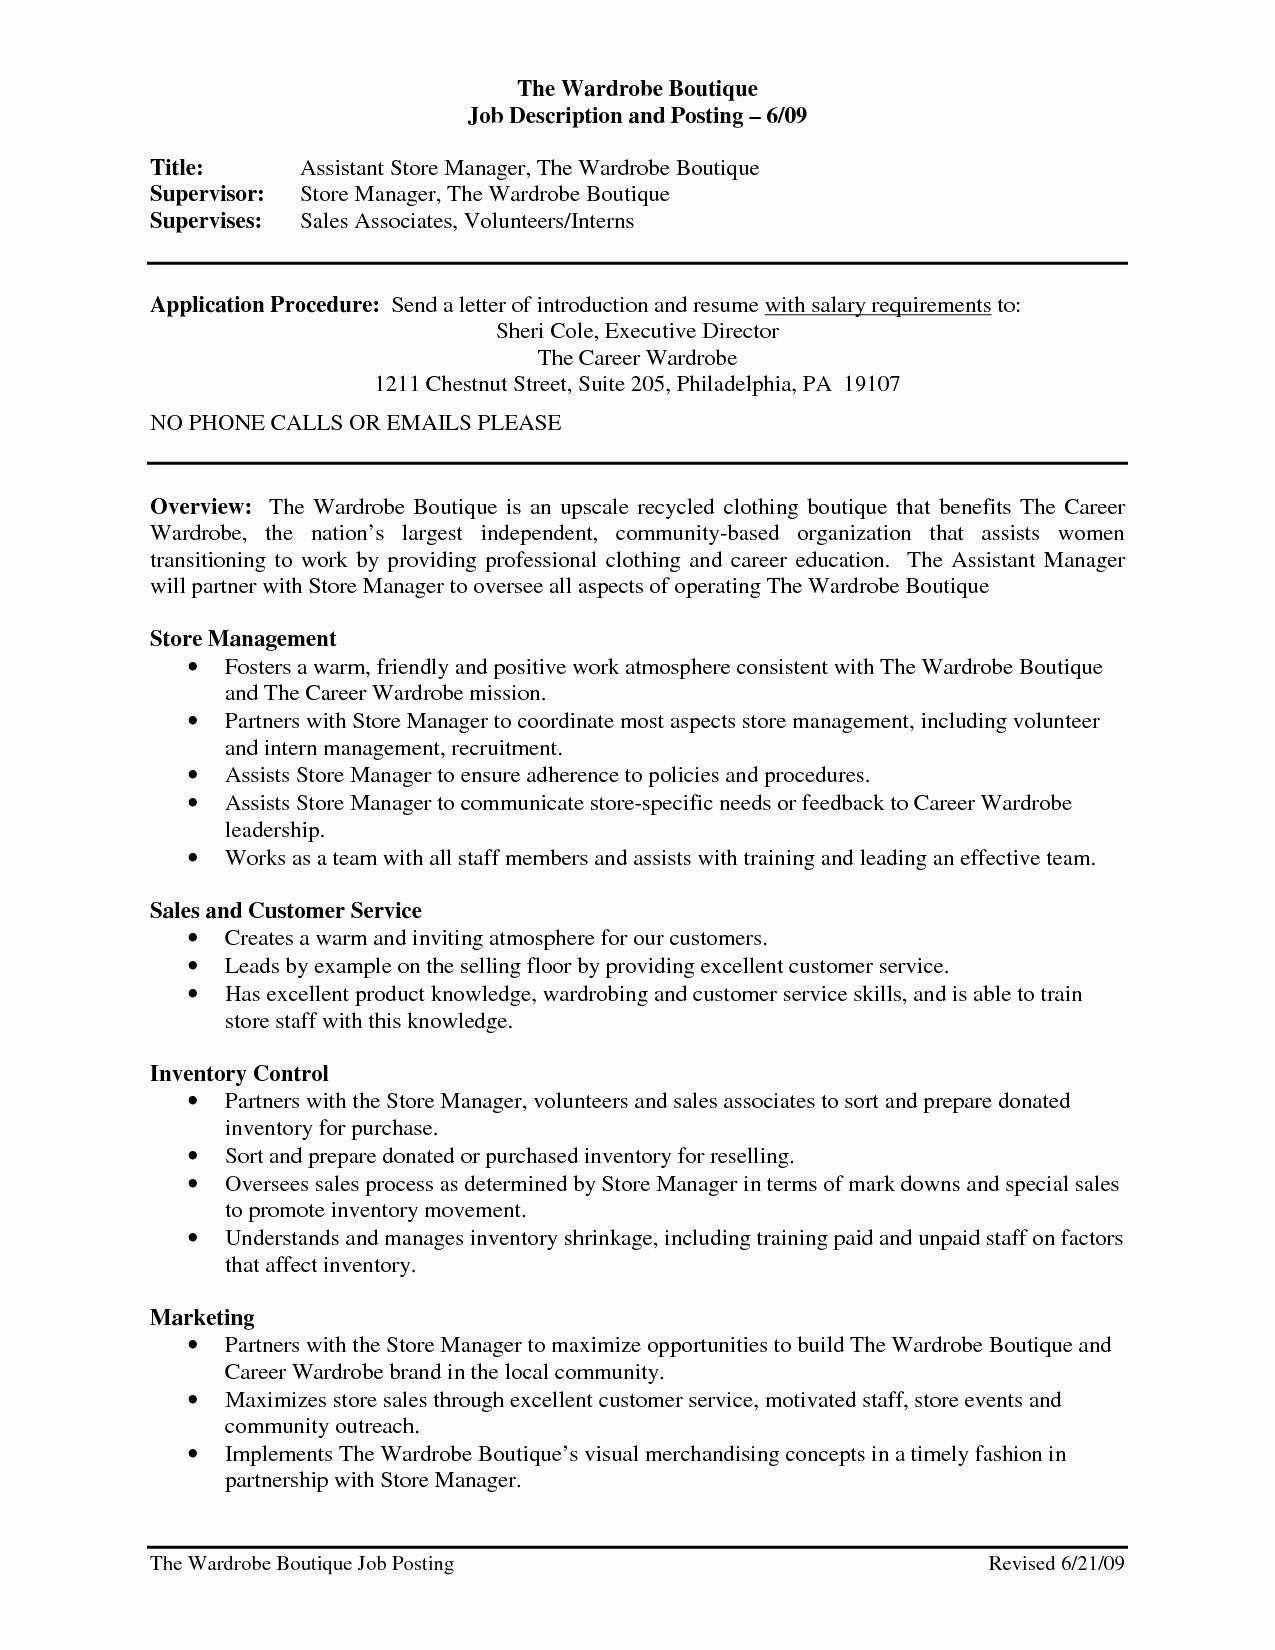 Resume for Sales associate Inspirational Resume Samples